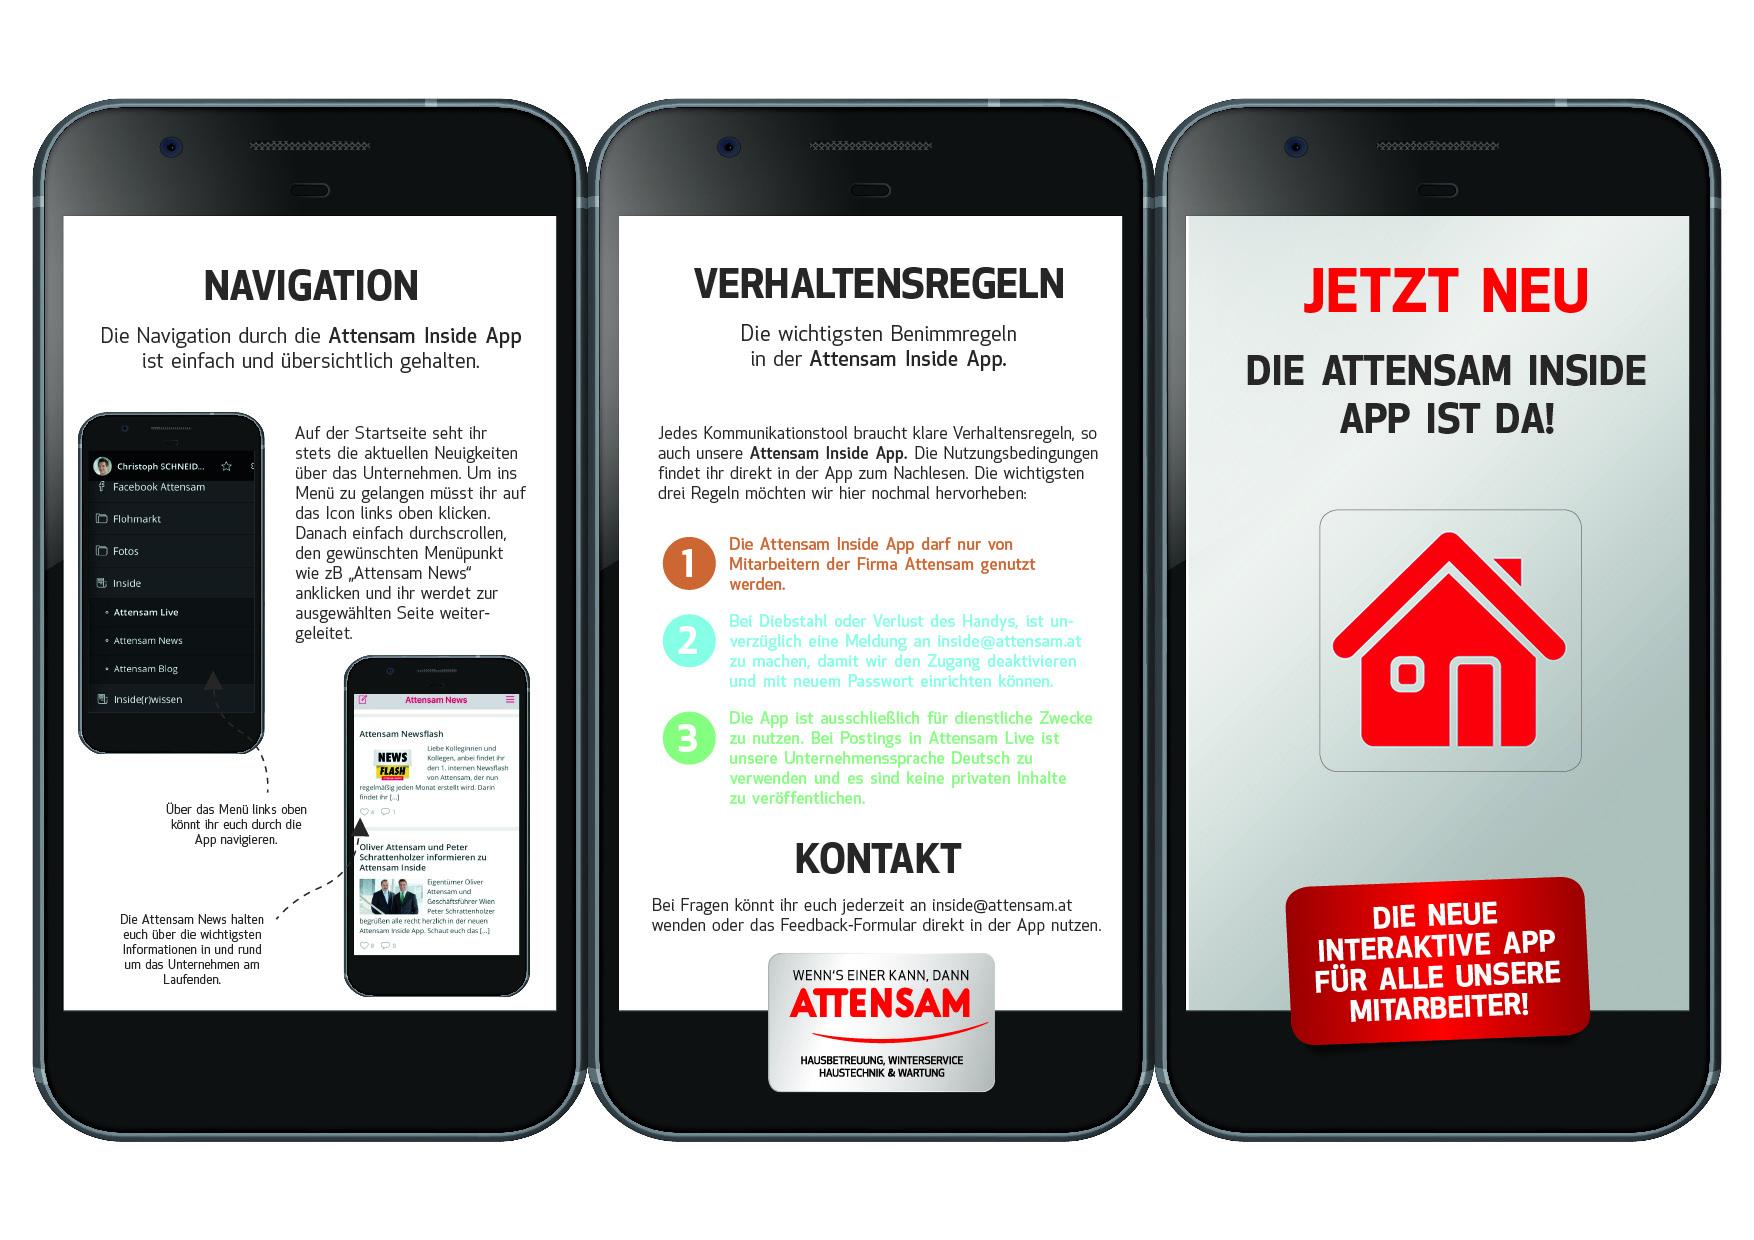 Mitarbeiter-App Attensam, Onboarding